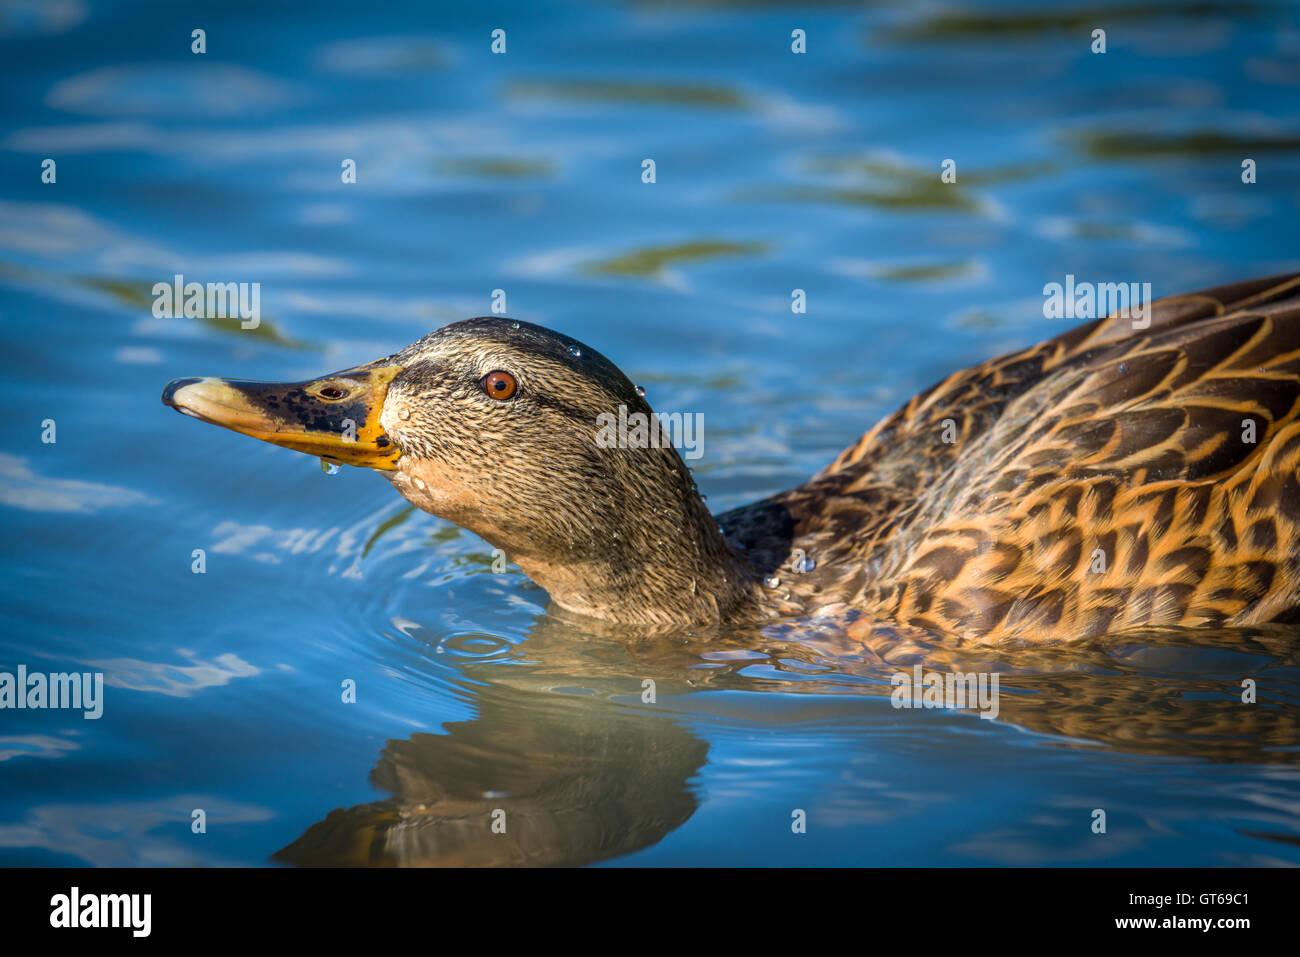 Female Mallard Duck - Stock Image